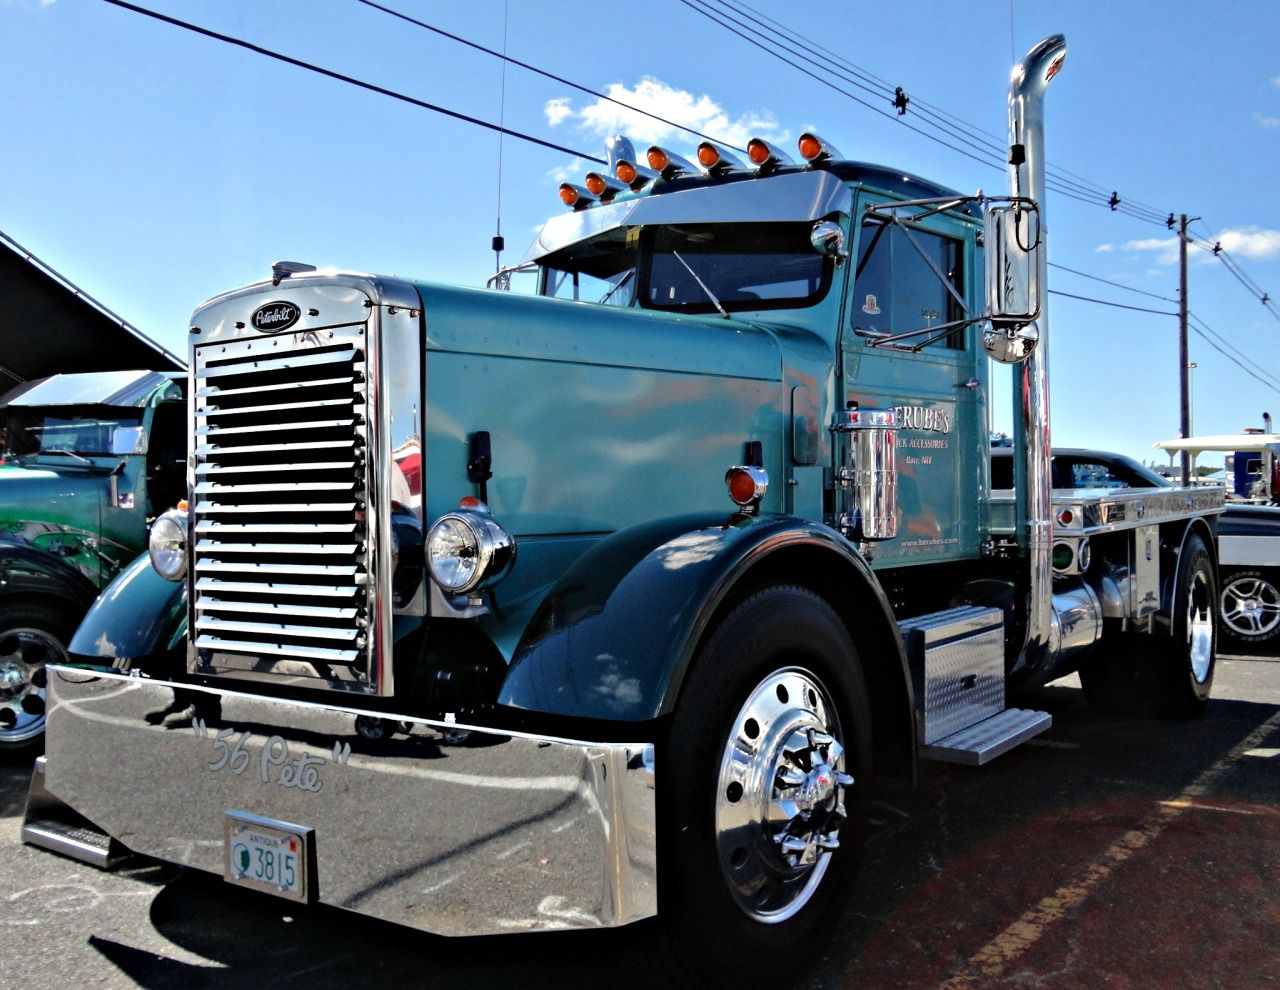 1956 Peterbilt custom 281   Peterbilt Trucks!!!!   Big rig